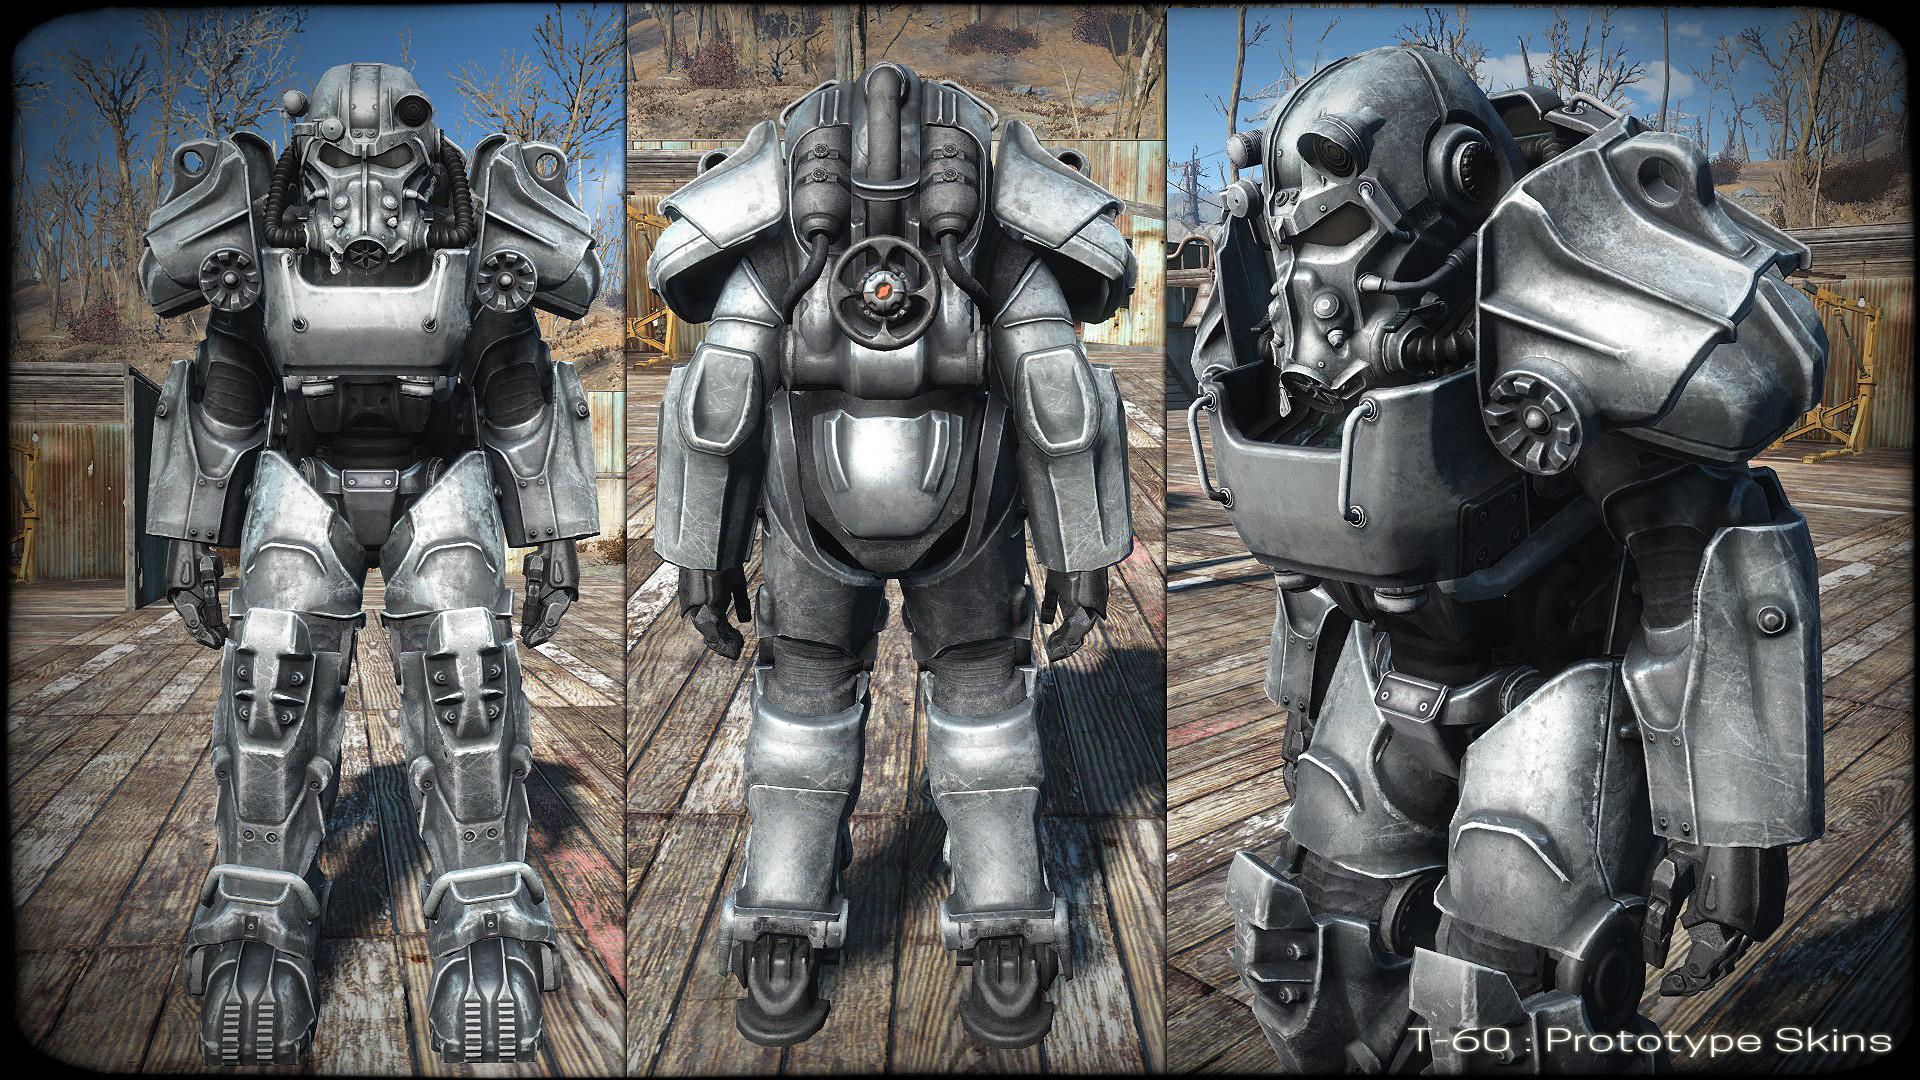 t60-fallout-prototype-skins.jpg